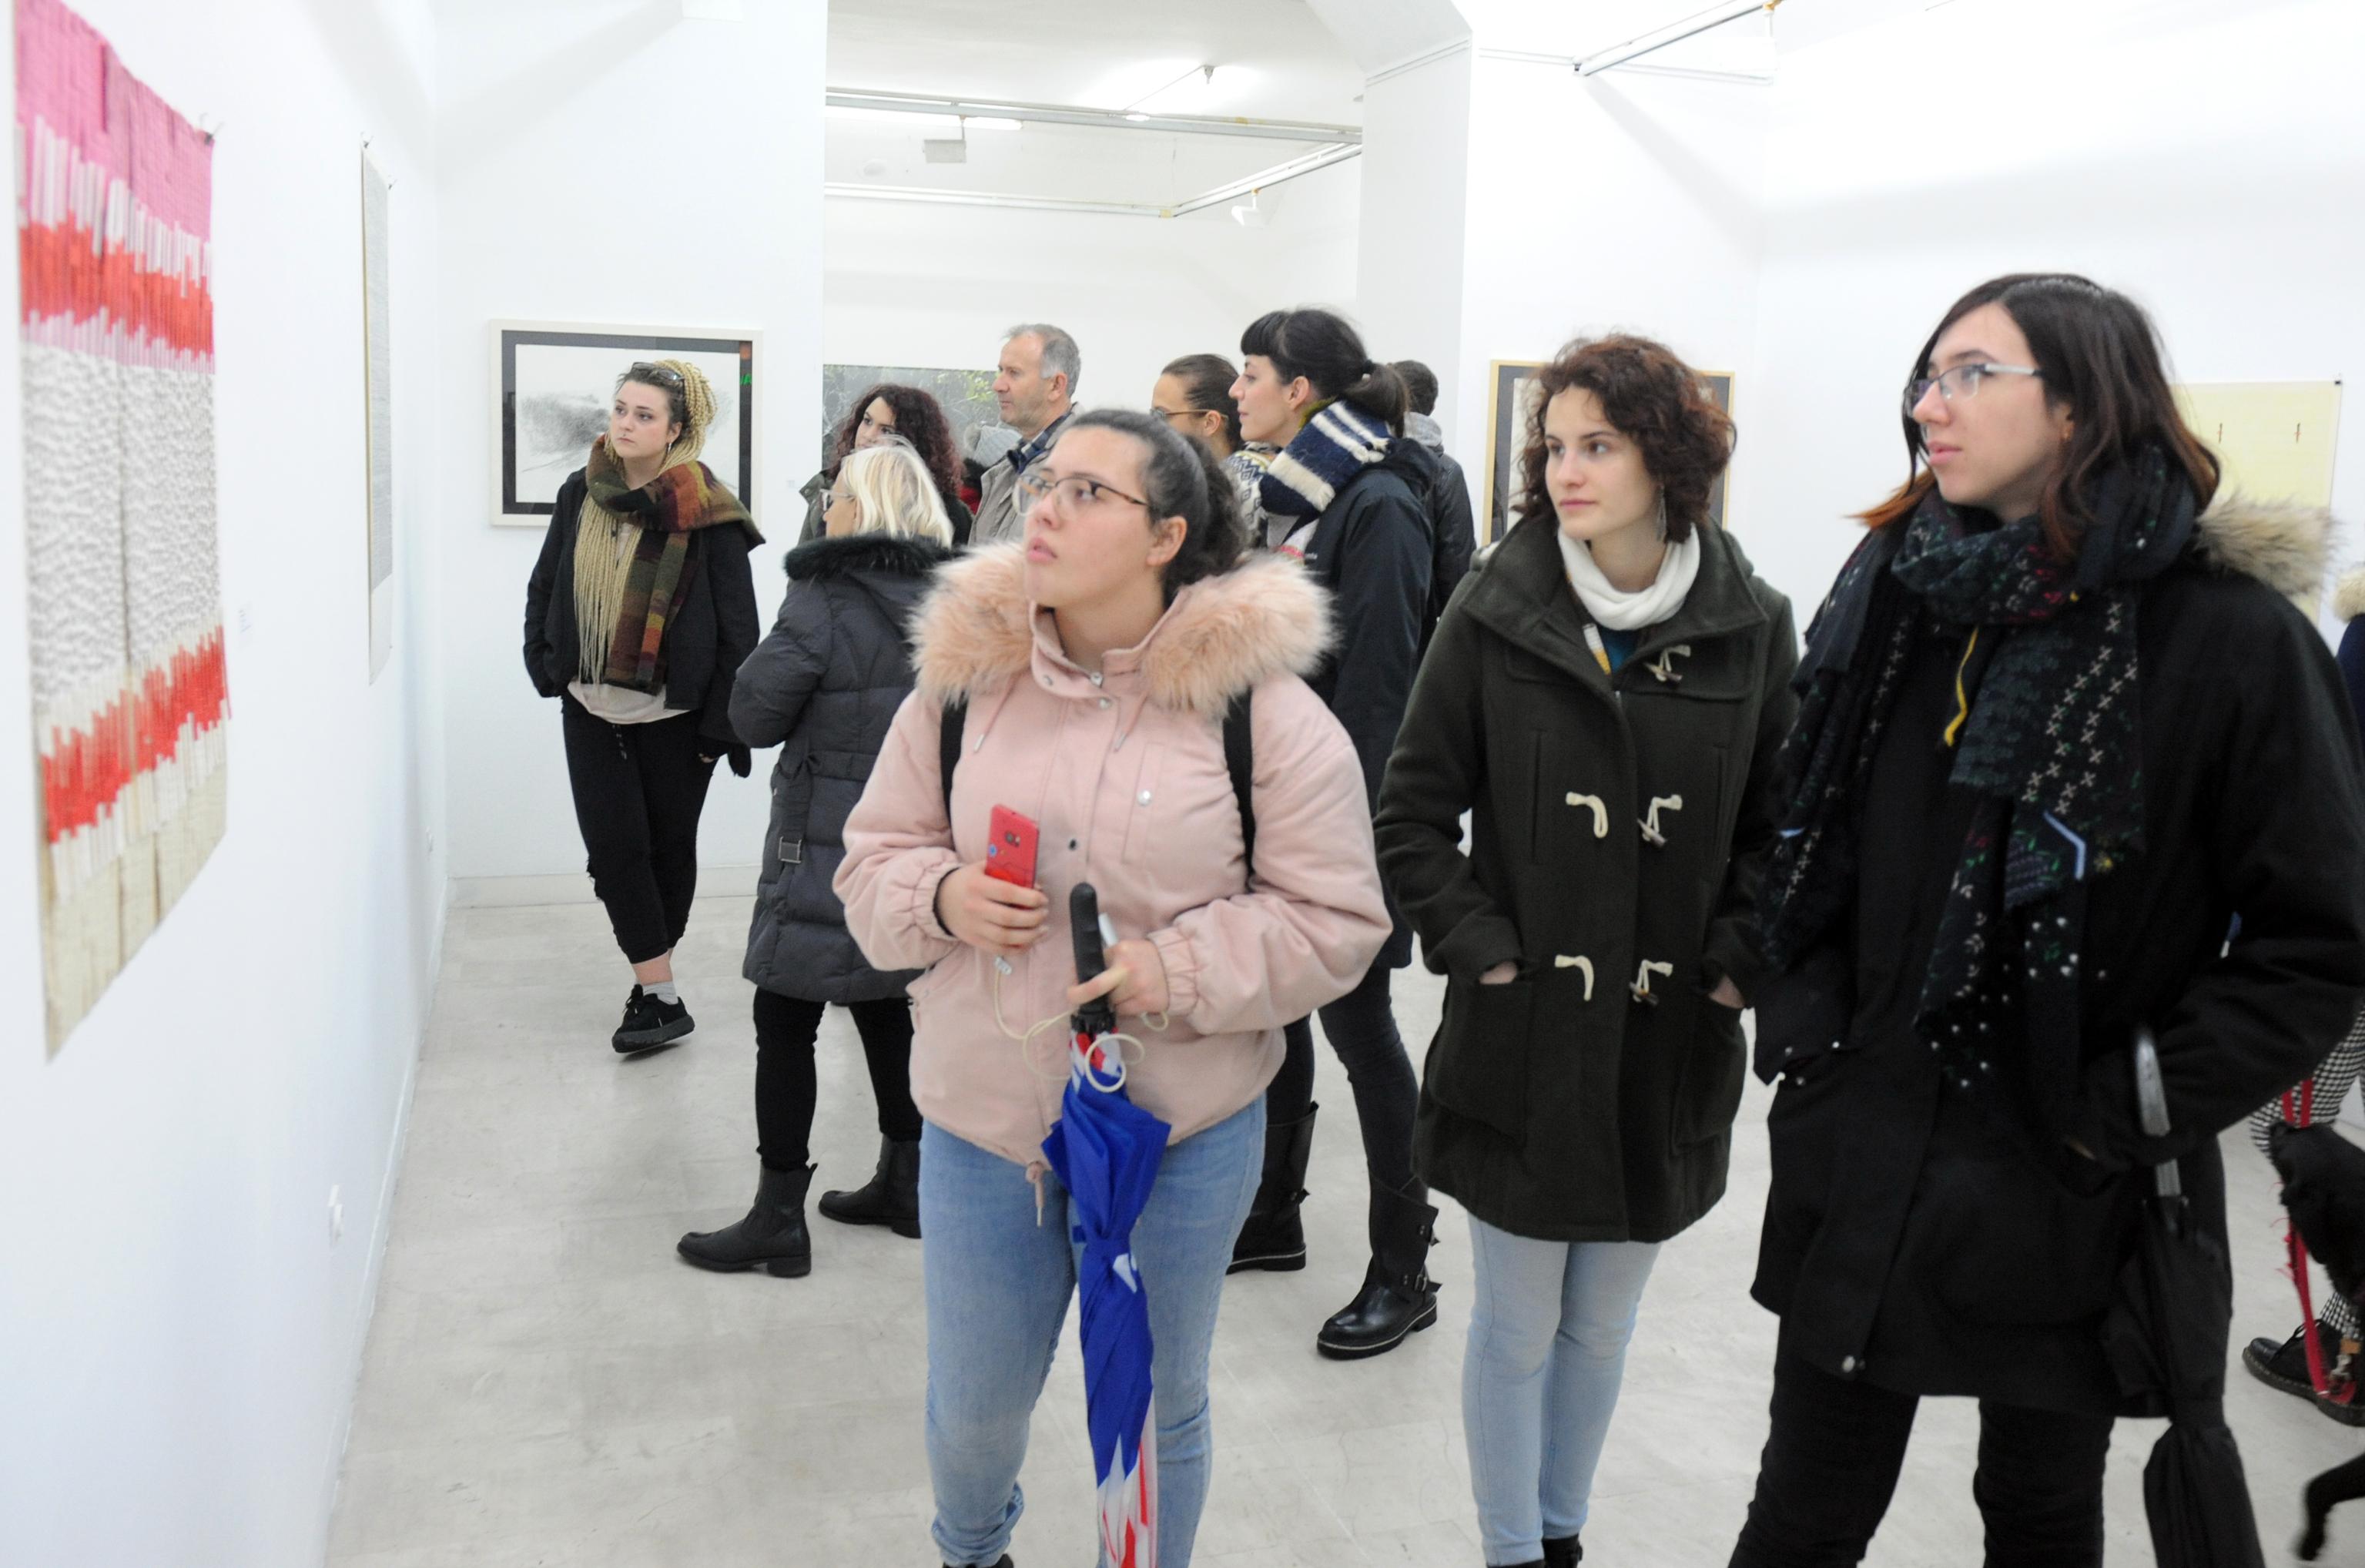 Noć muzeja, Mali salon - izložba »Hommage crtežu«, snimio Marko GRACIN